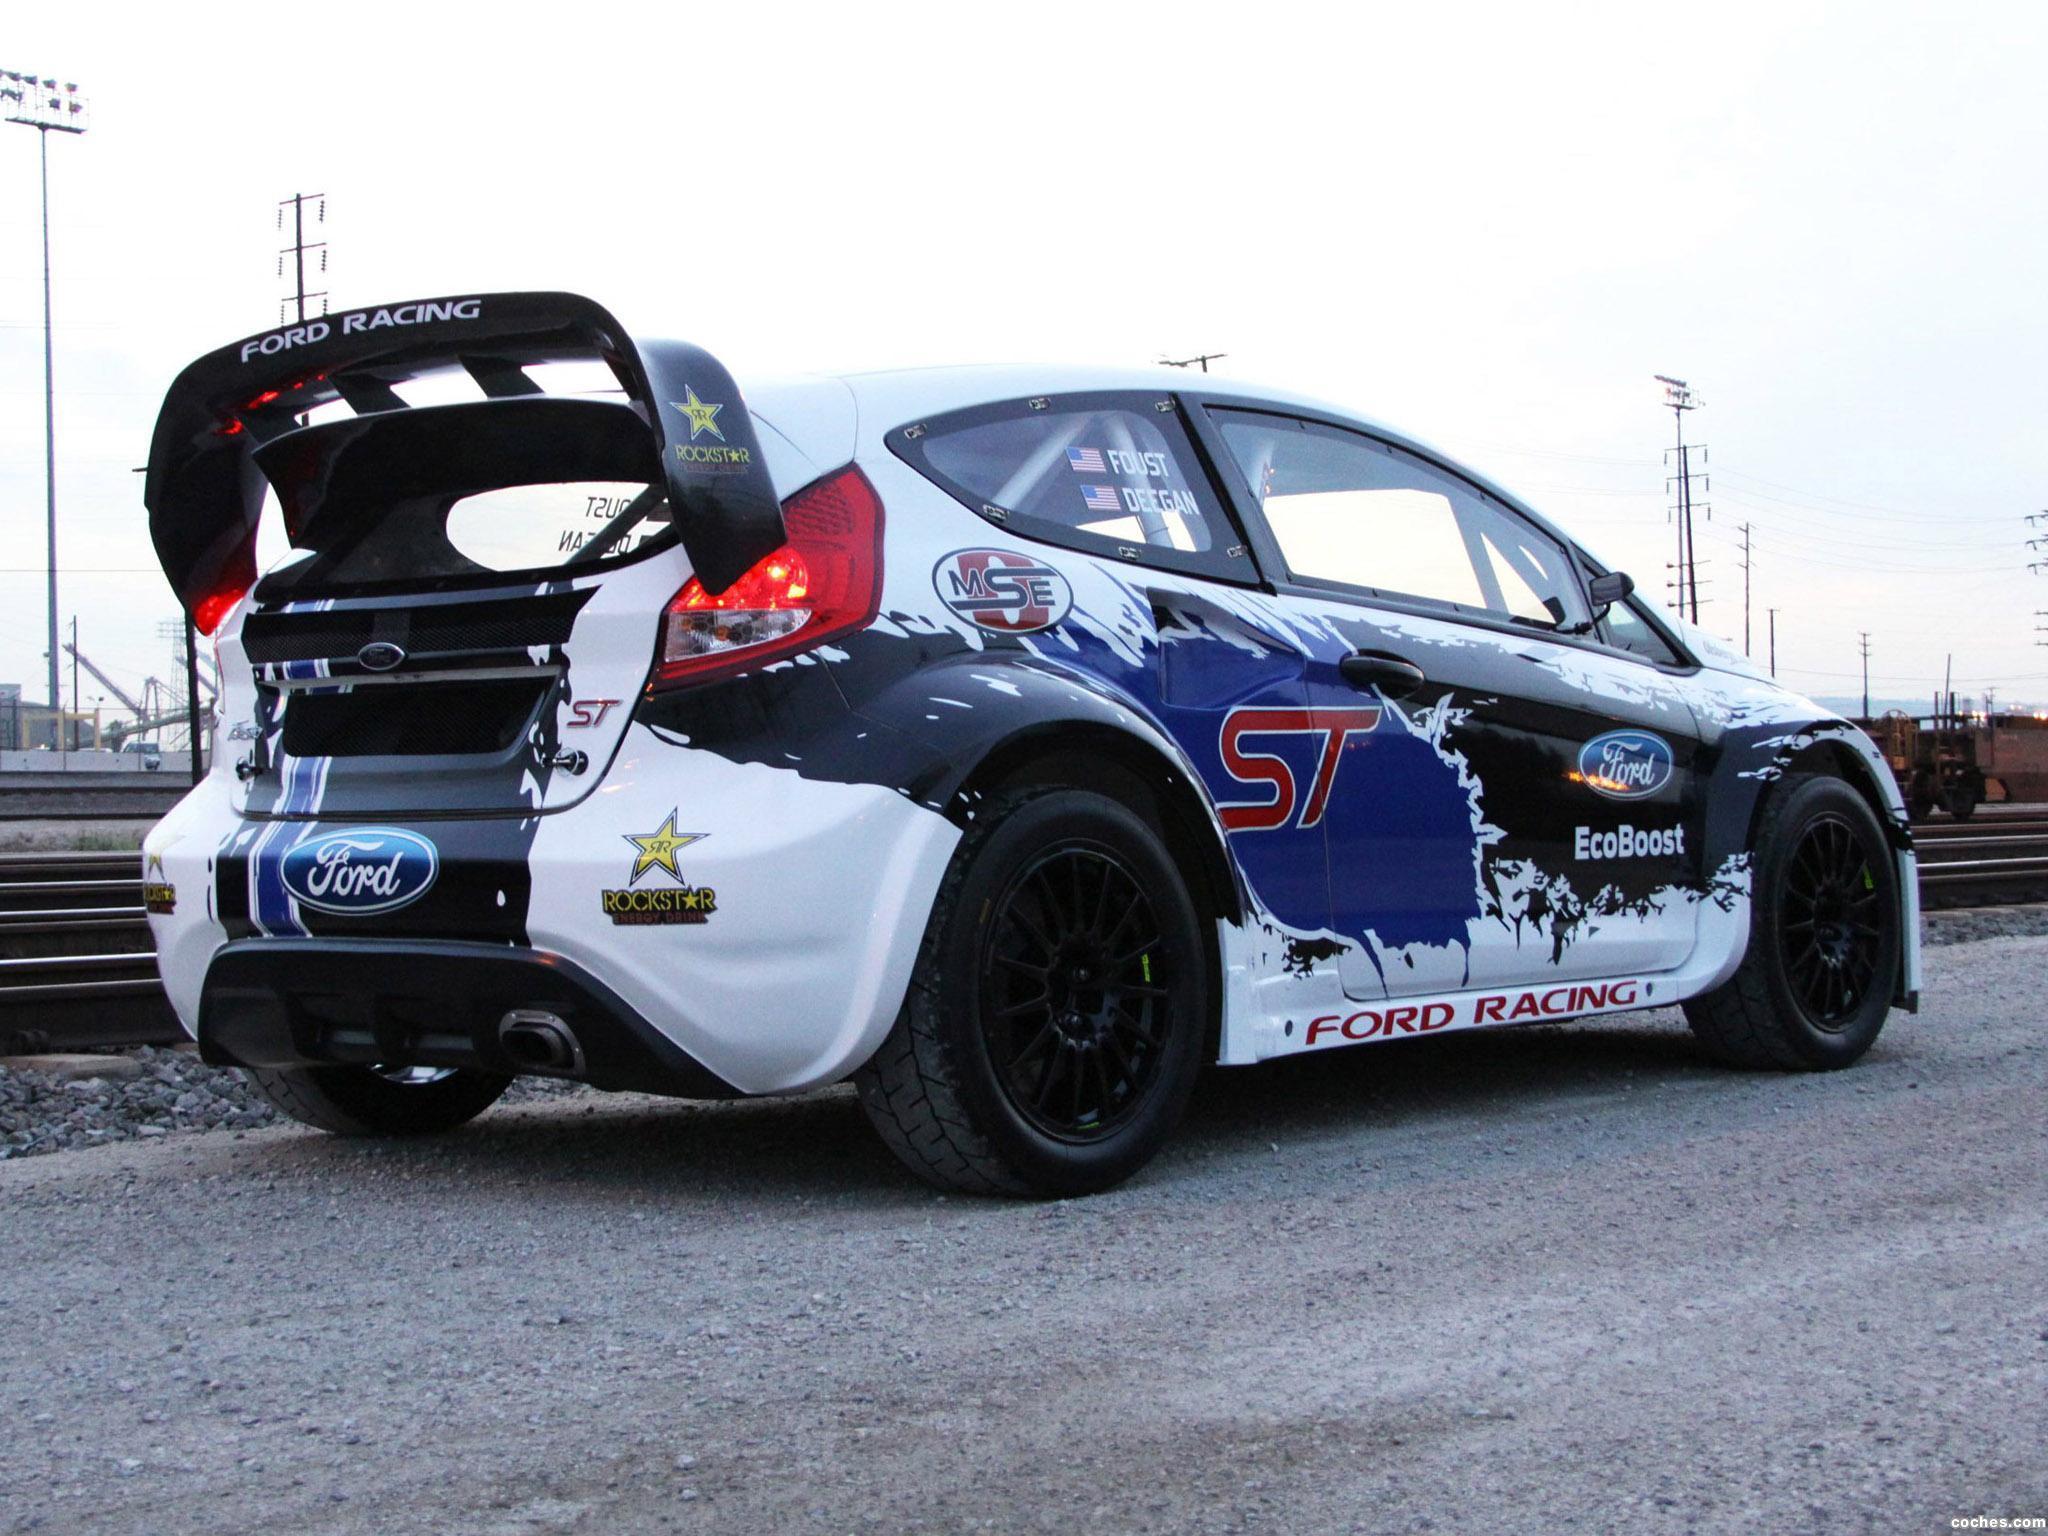 Foto 1 de Ford Fiesta ST Global Rallycross Championship Race Rar 2013